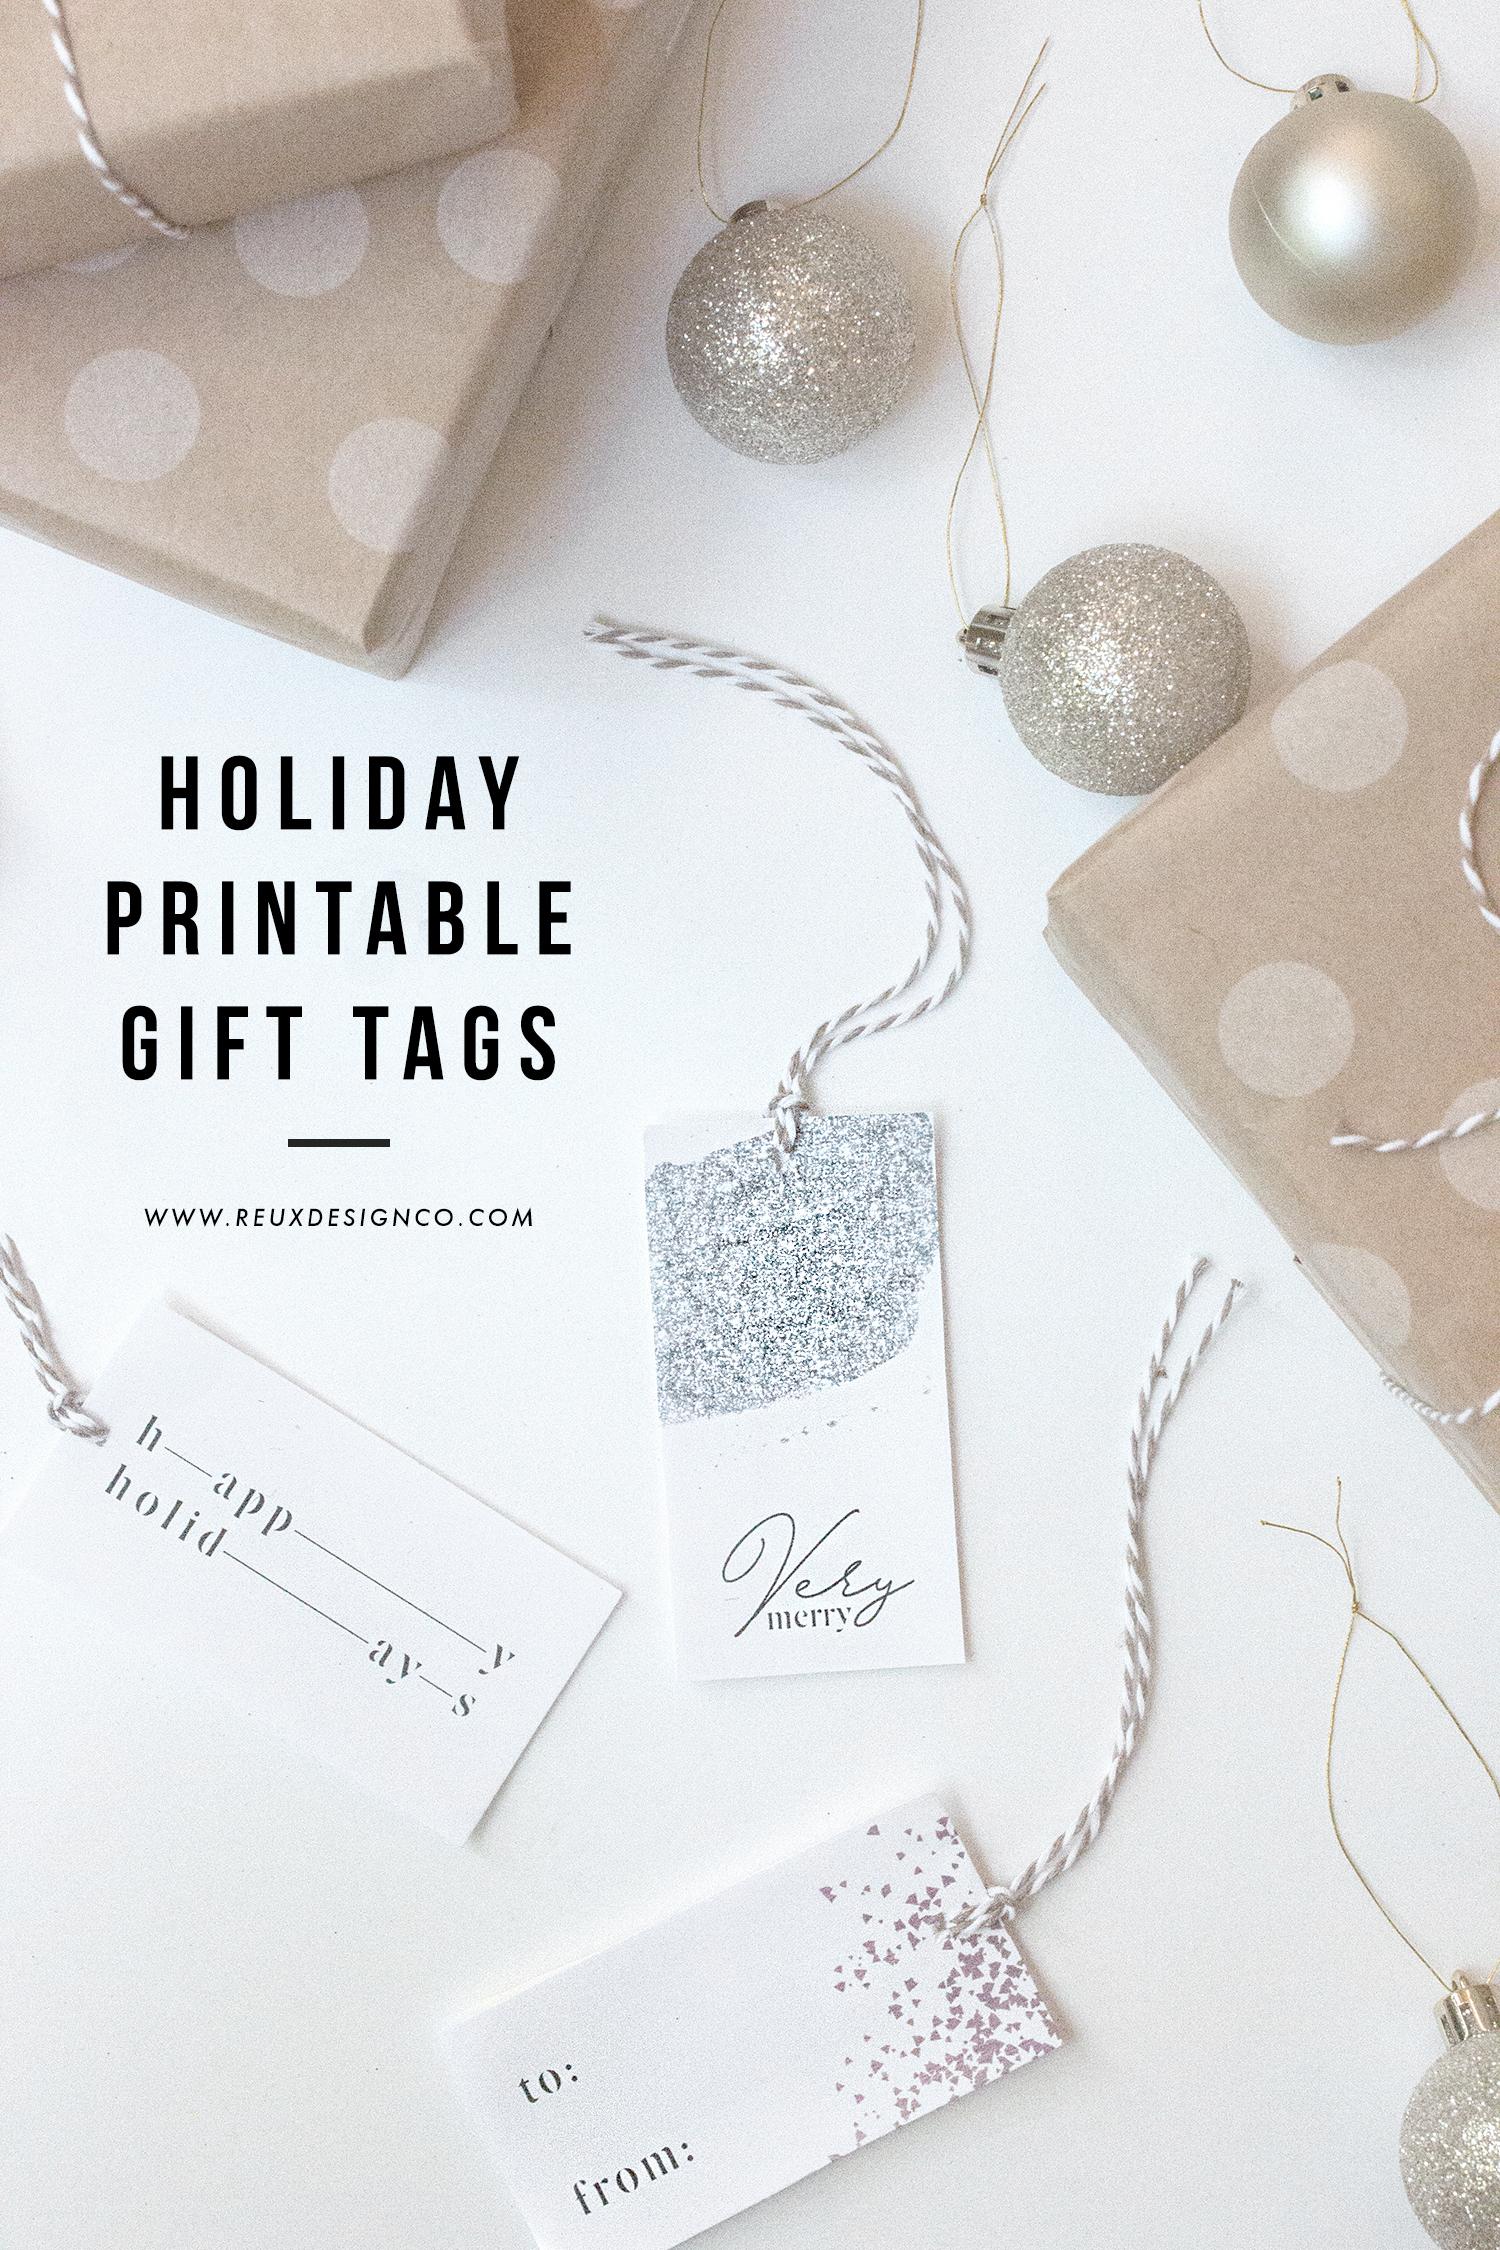 holiday gift tags   download and print diy tags